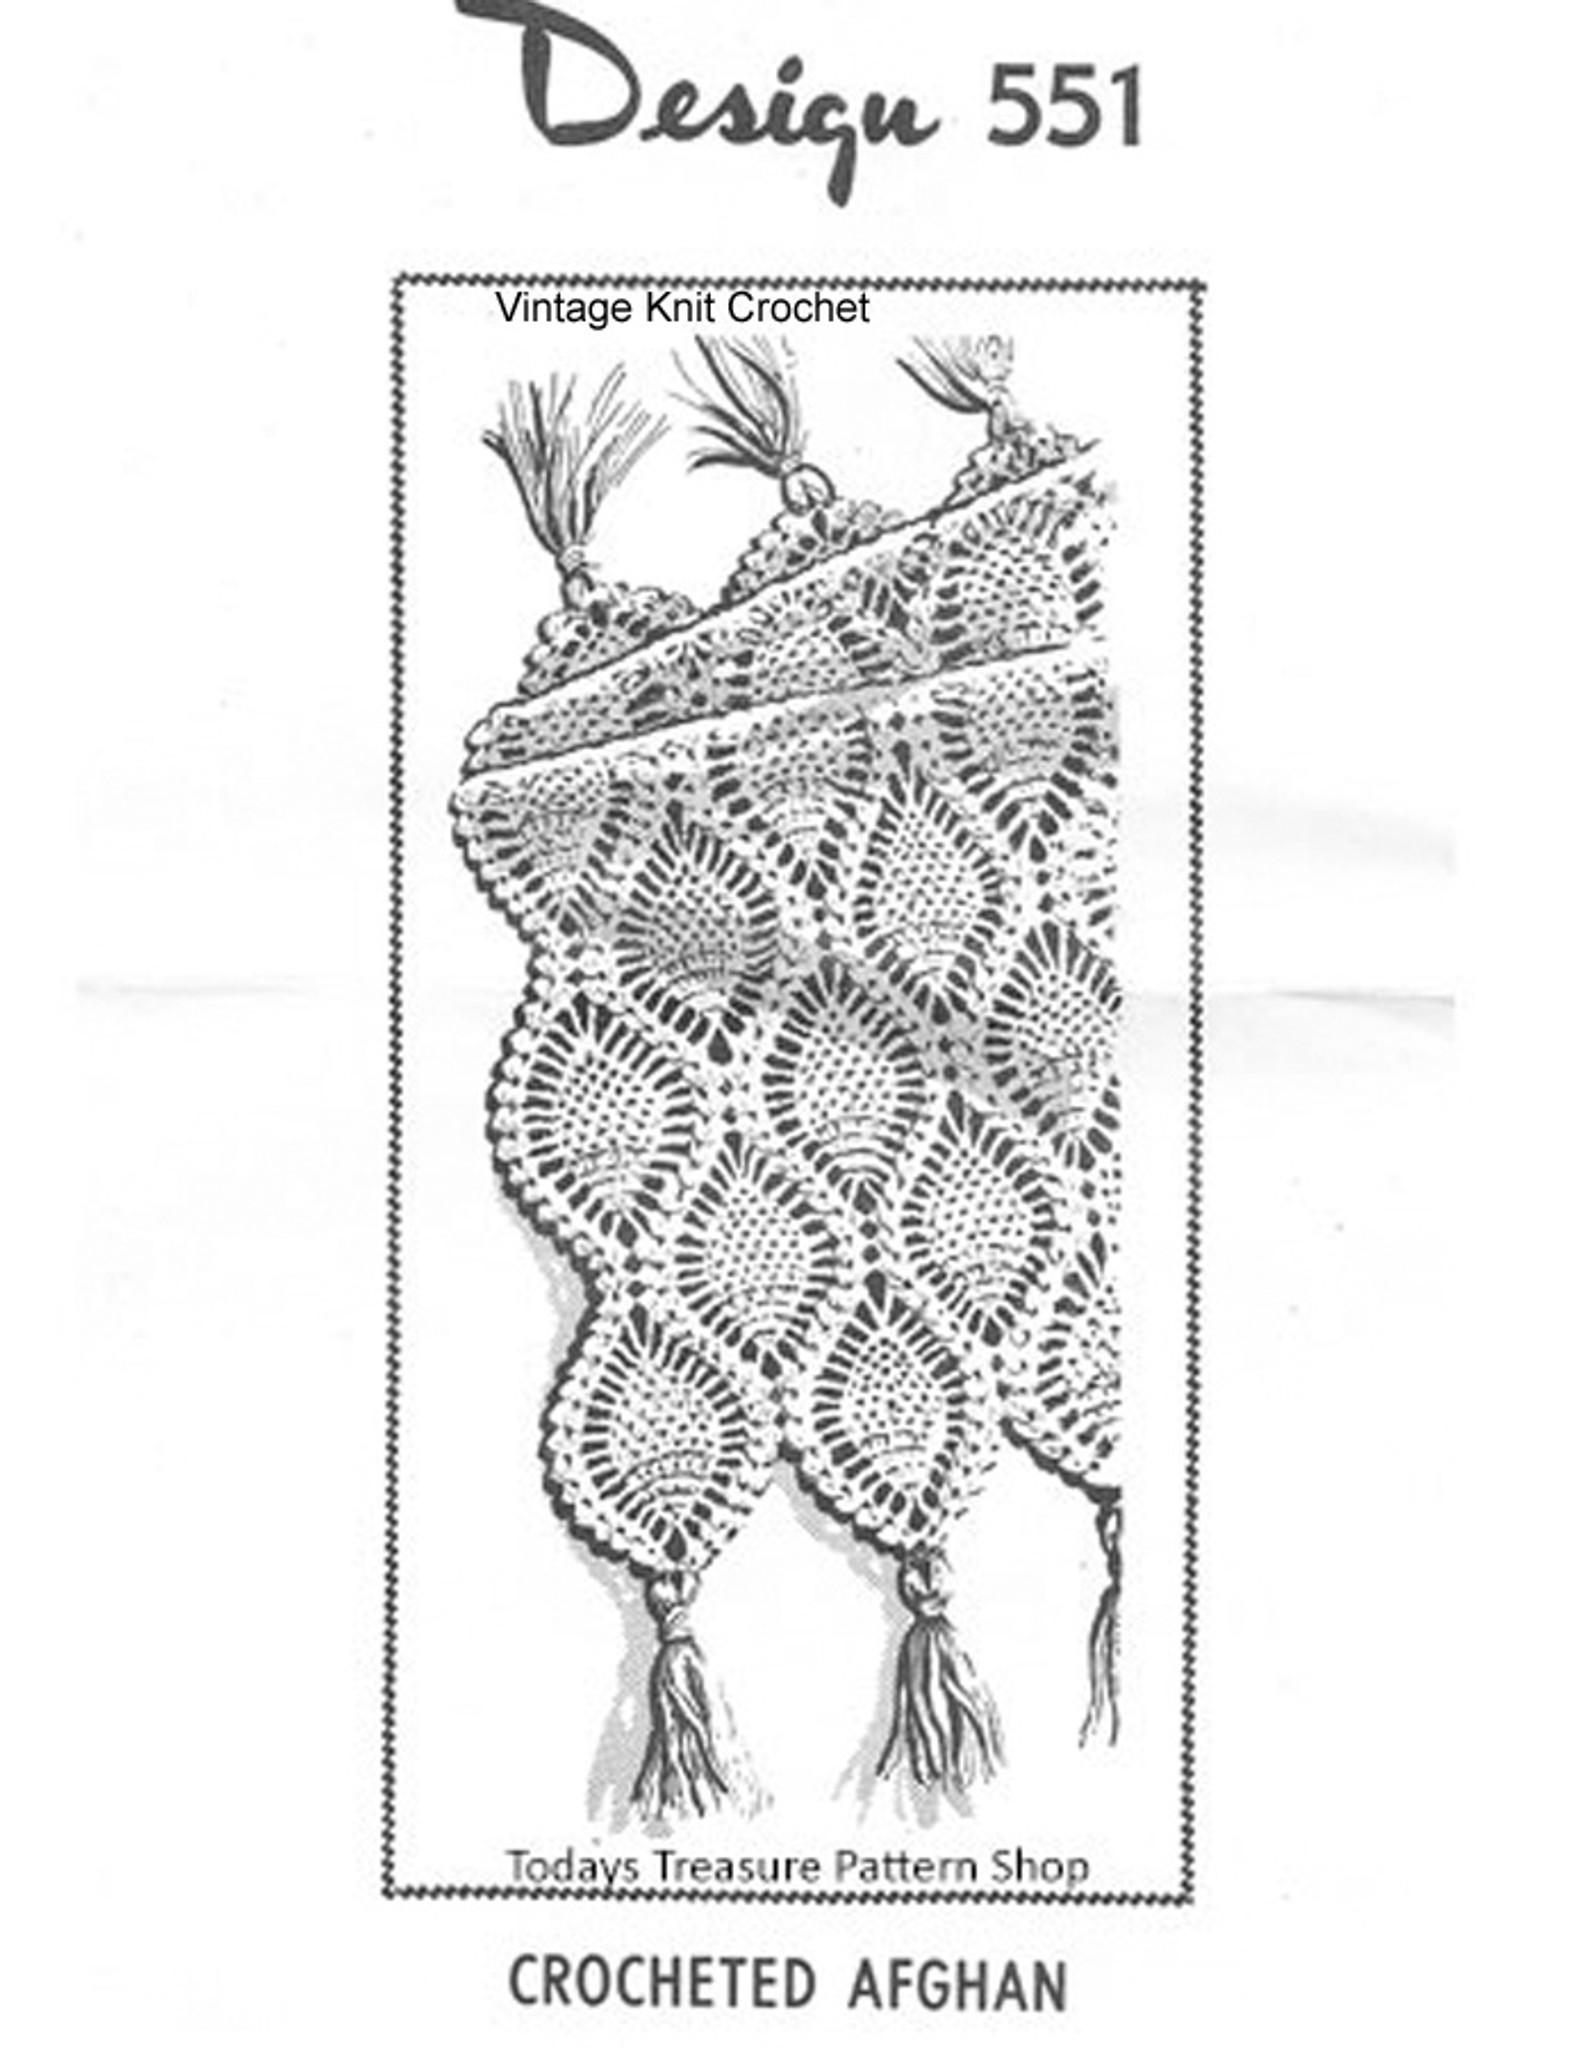 Crocheted Pineapple Afghan Pattern Laura Wheeler 551 Mail Ordder